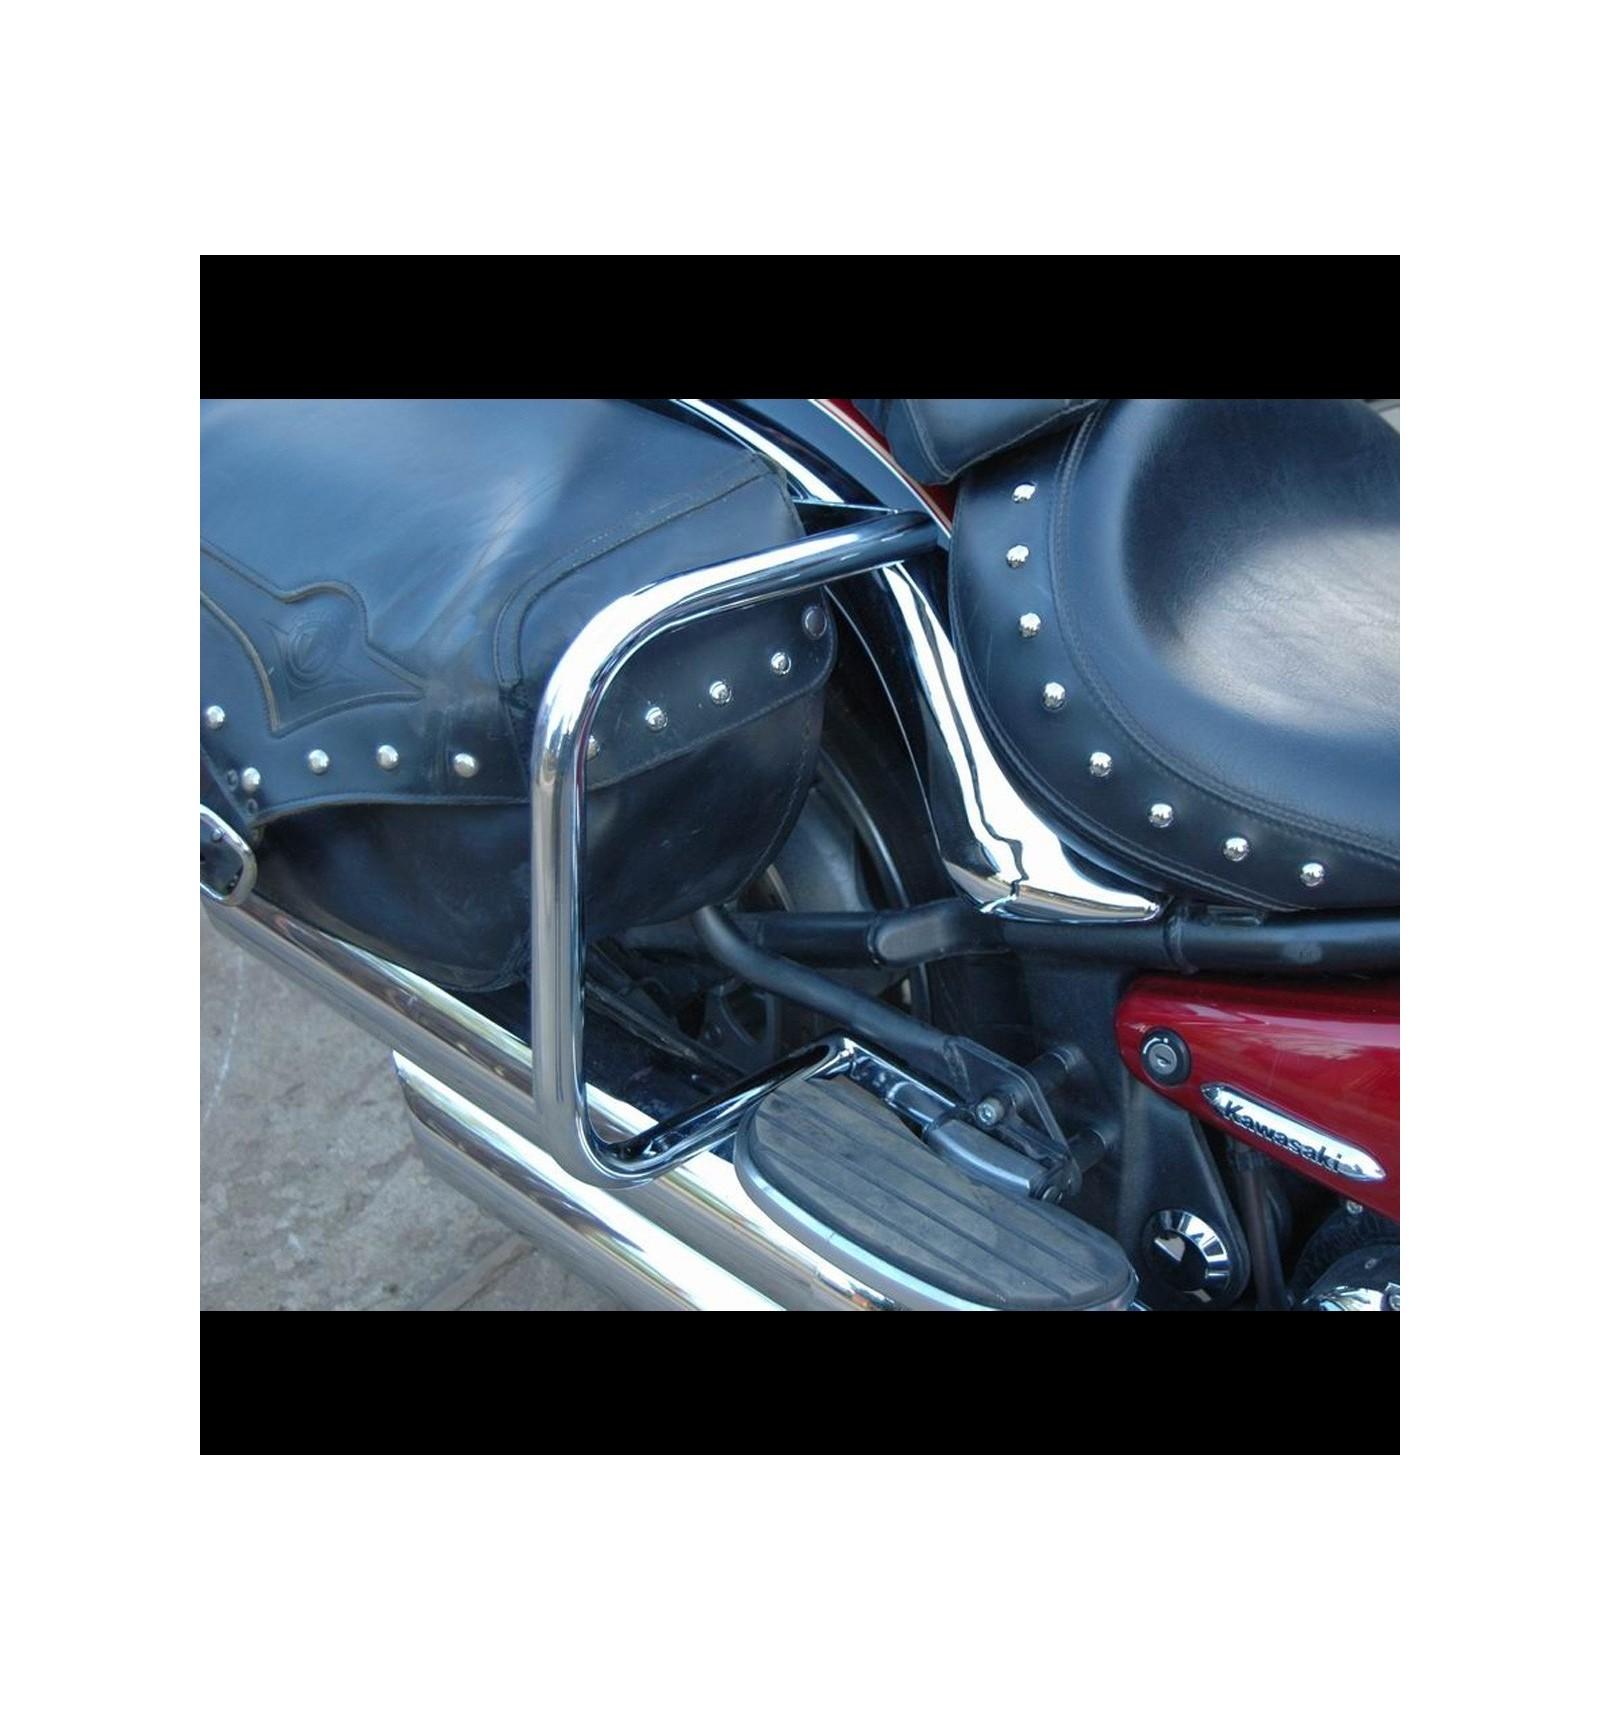 KAWASAKI VN900 VULCAN CLASSIC CUSTOM CHROME REAR SADDLEBAG GUARD CRASH  BARS